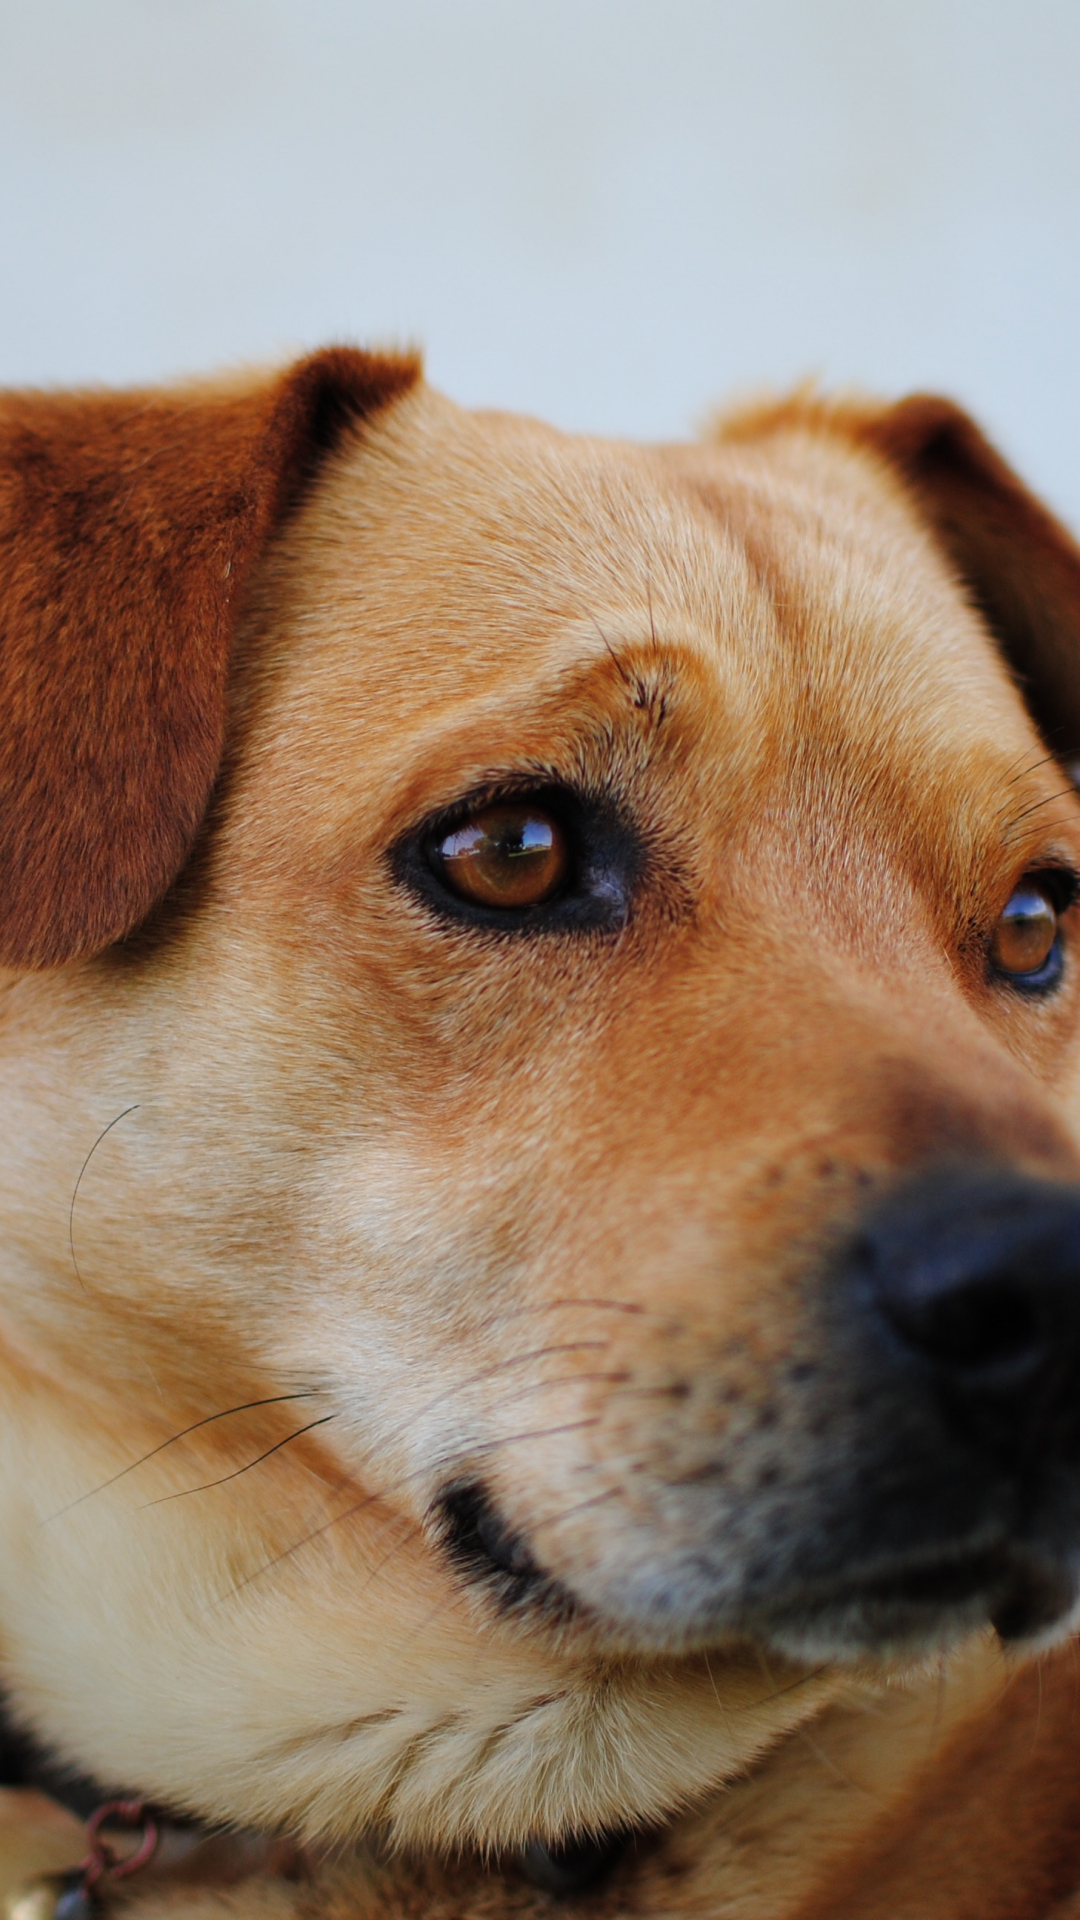 dog animal pet puppy iphone wallpaper idrop news